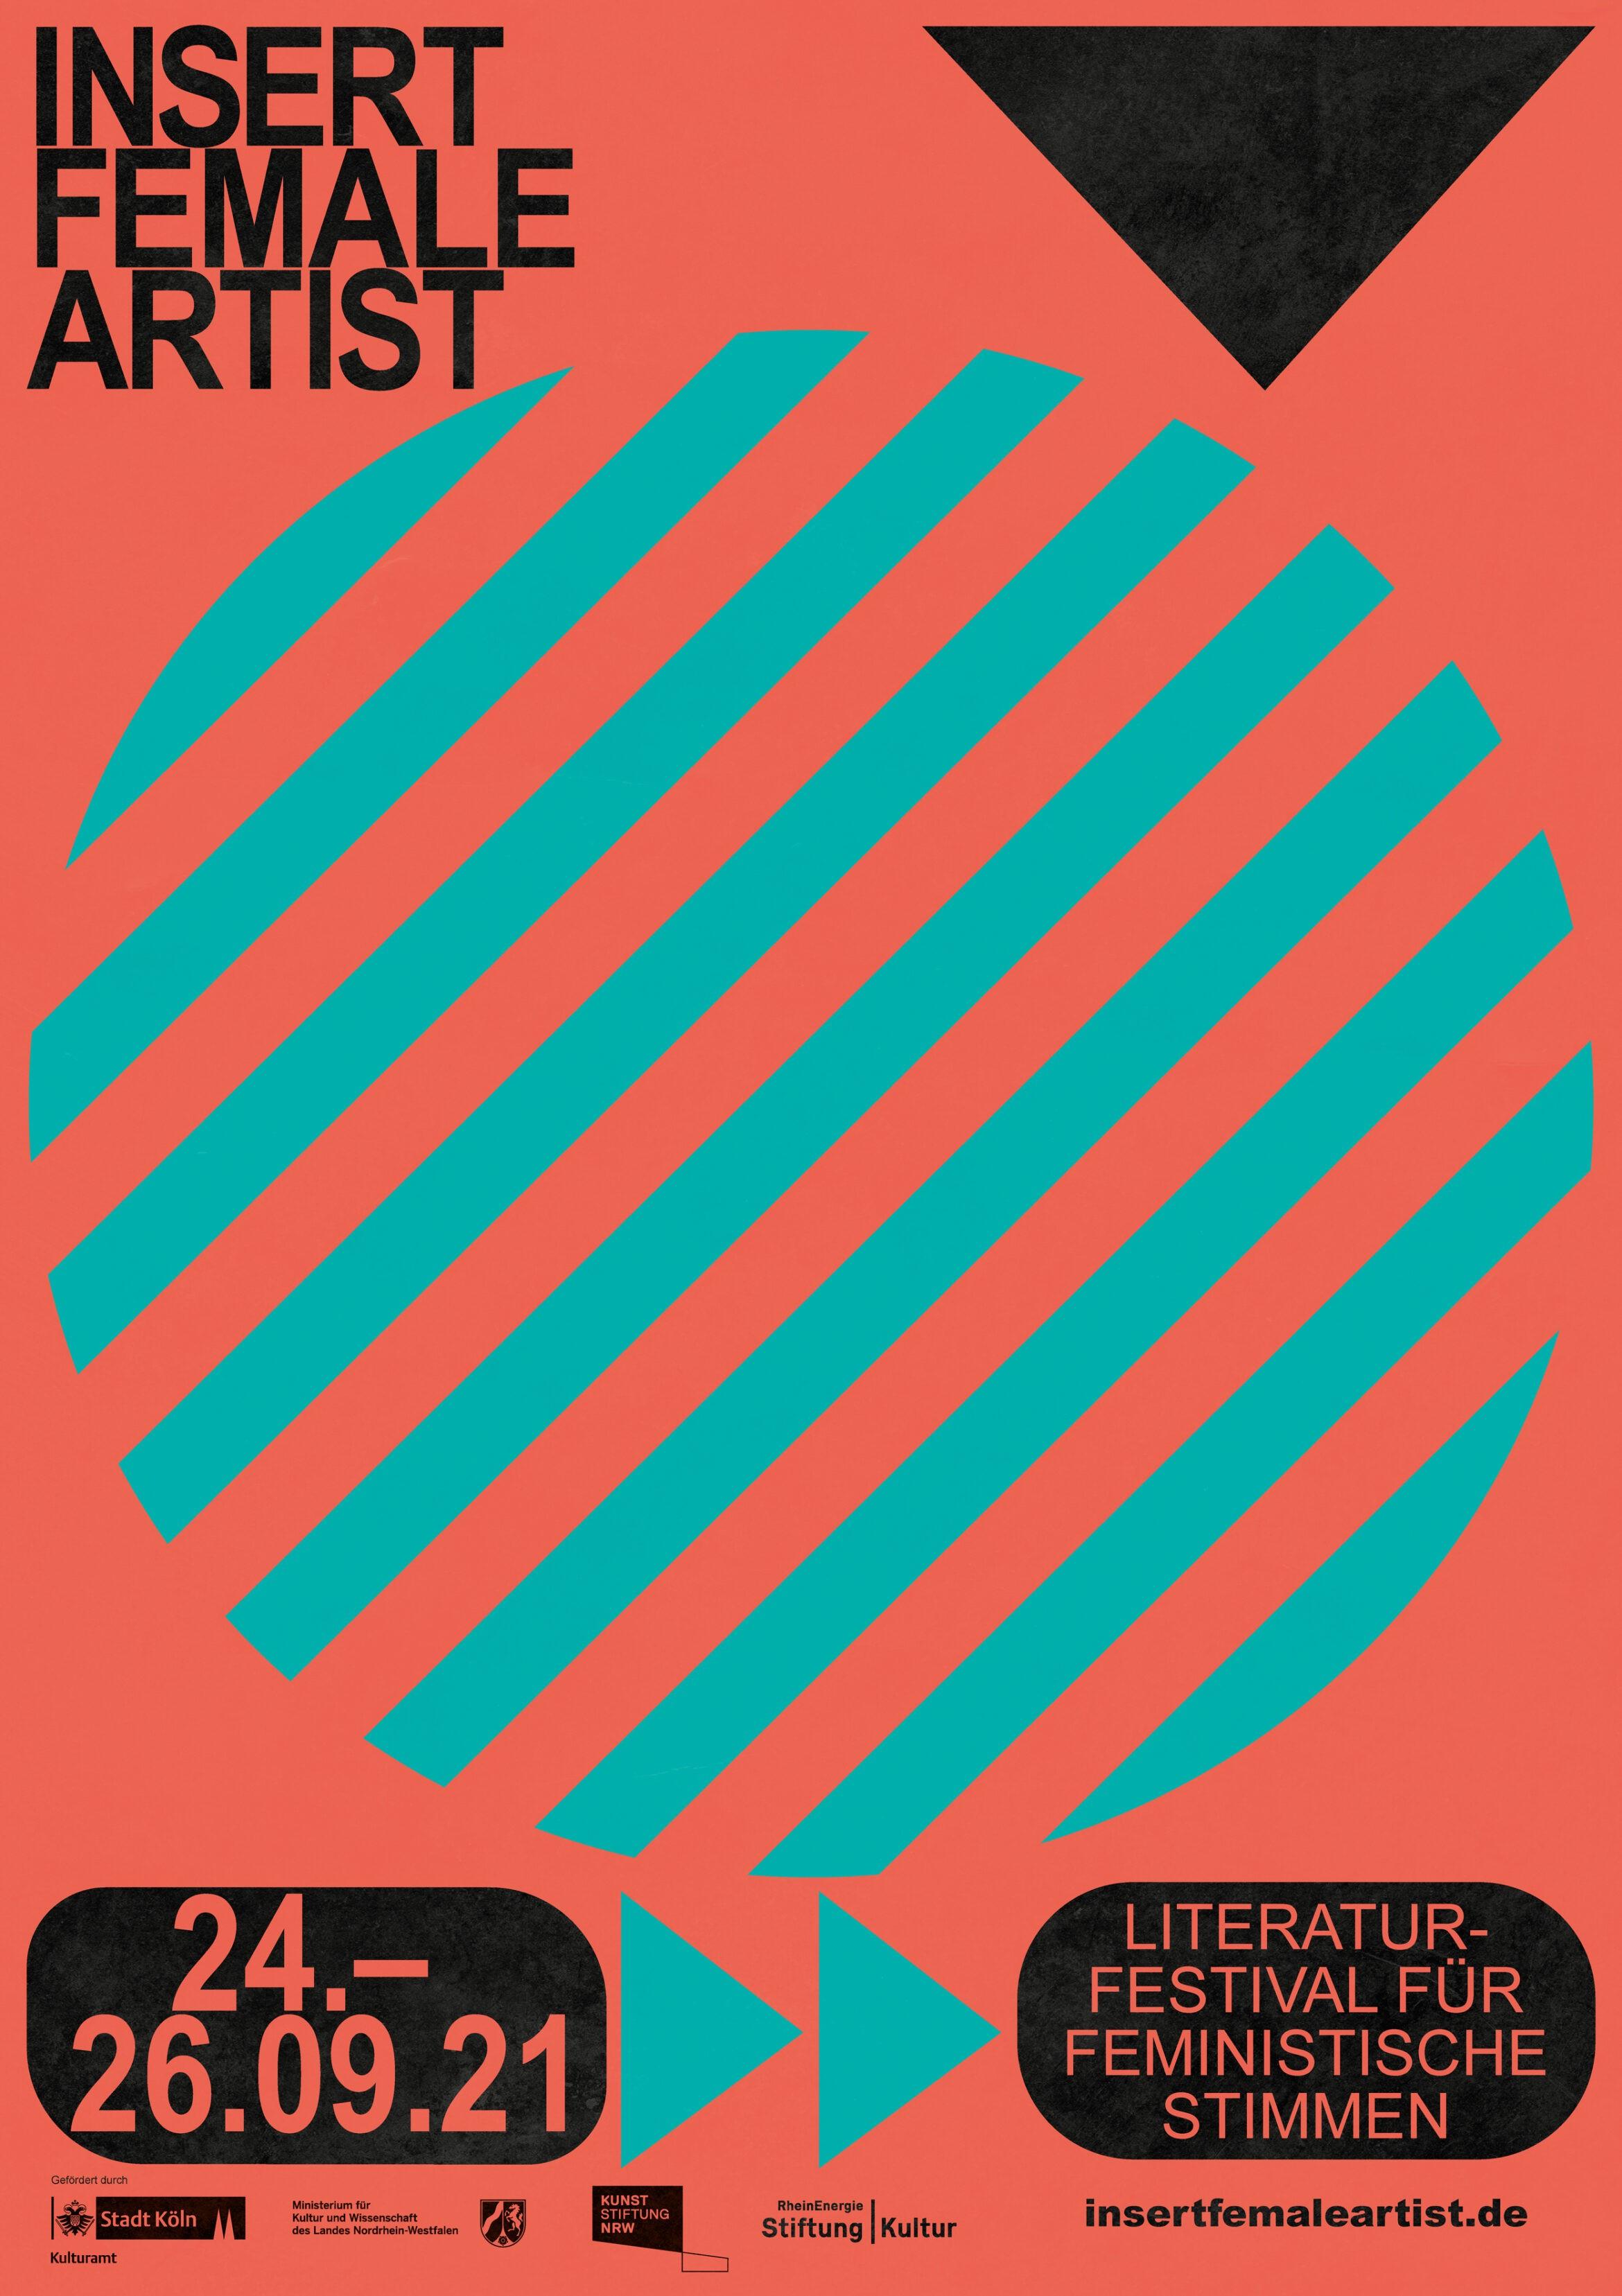 Insert Female Artist | Plakat | Literaturfestival | Astract